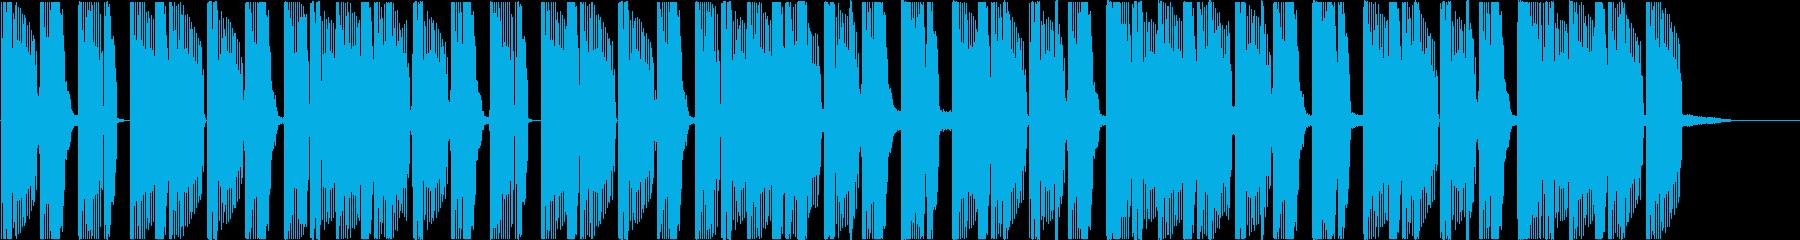 Deep bass-based electro jingle's reproduced waveform